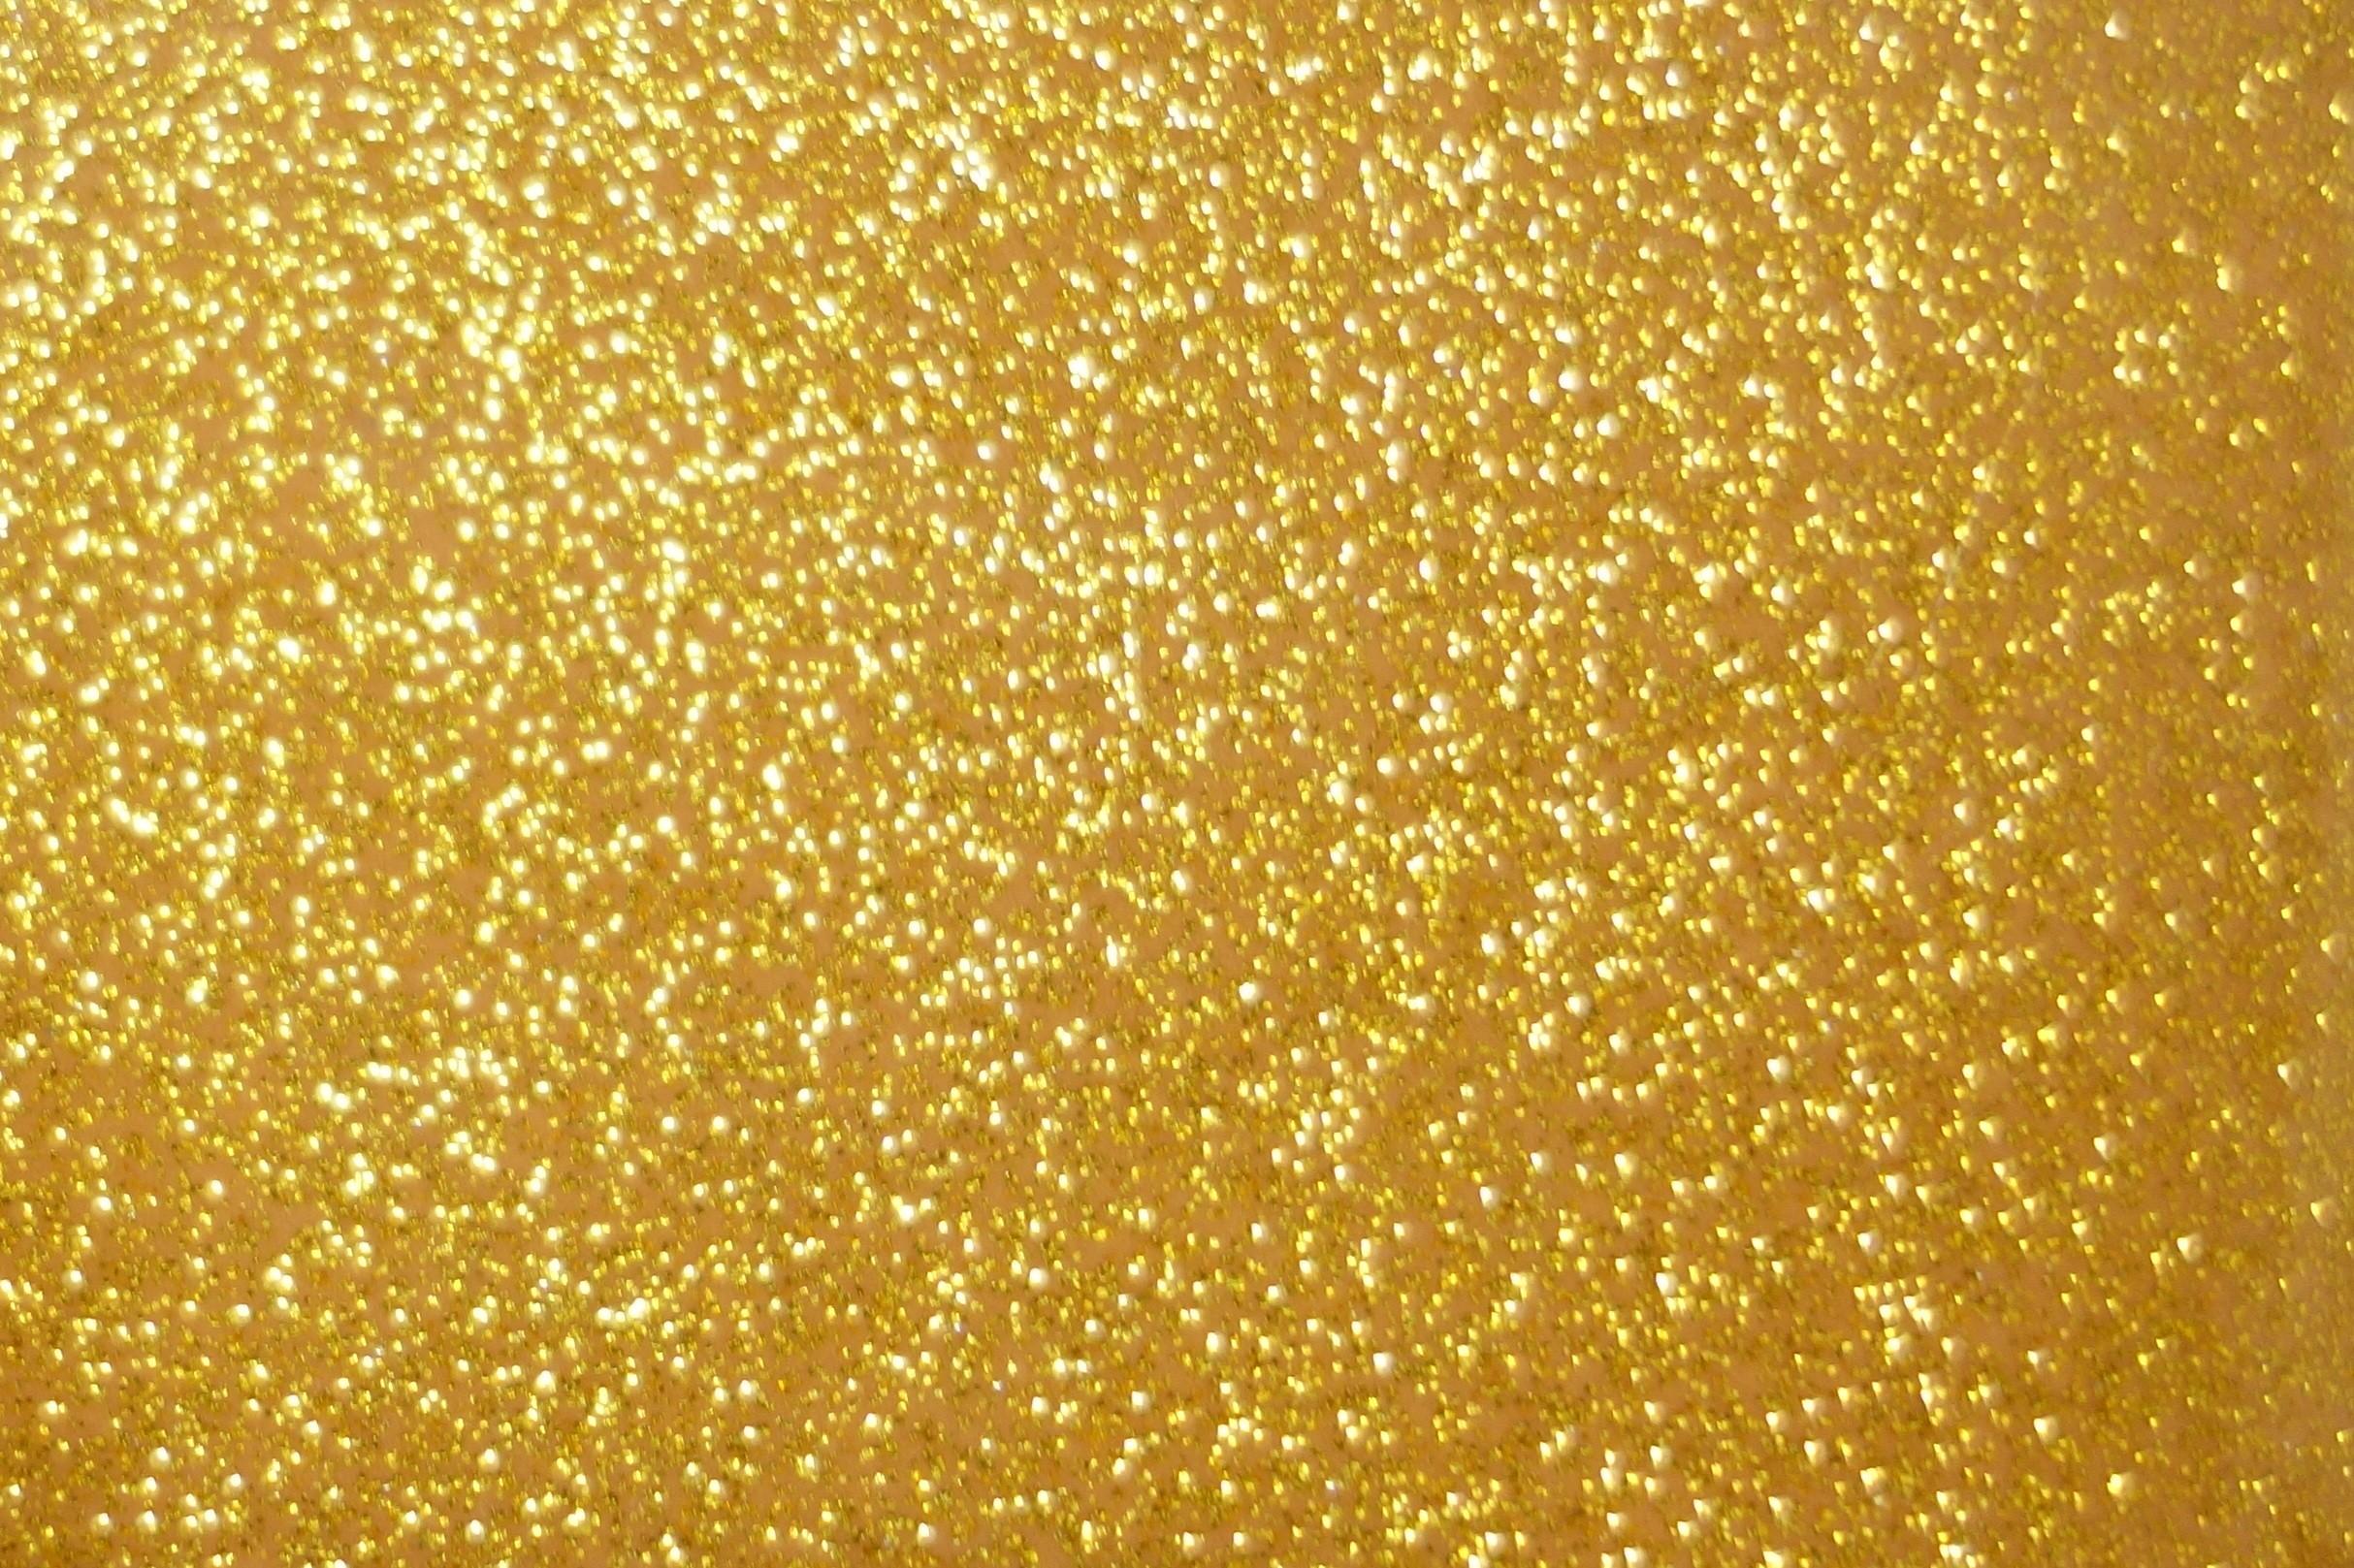 Gold Glitter Background ·① Download Free Beautiful